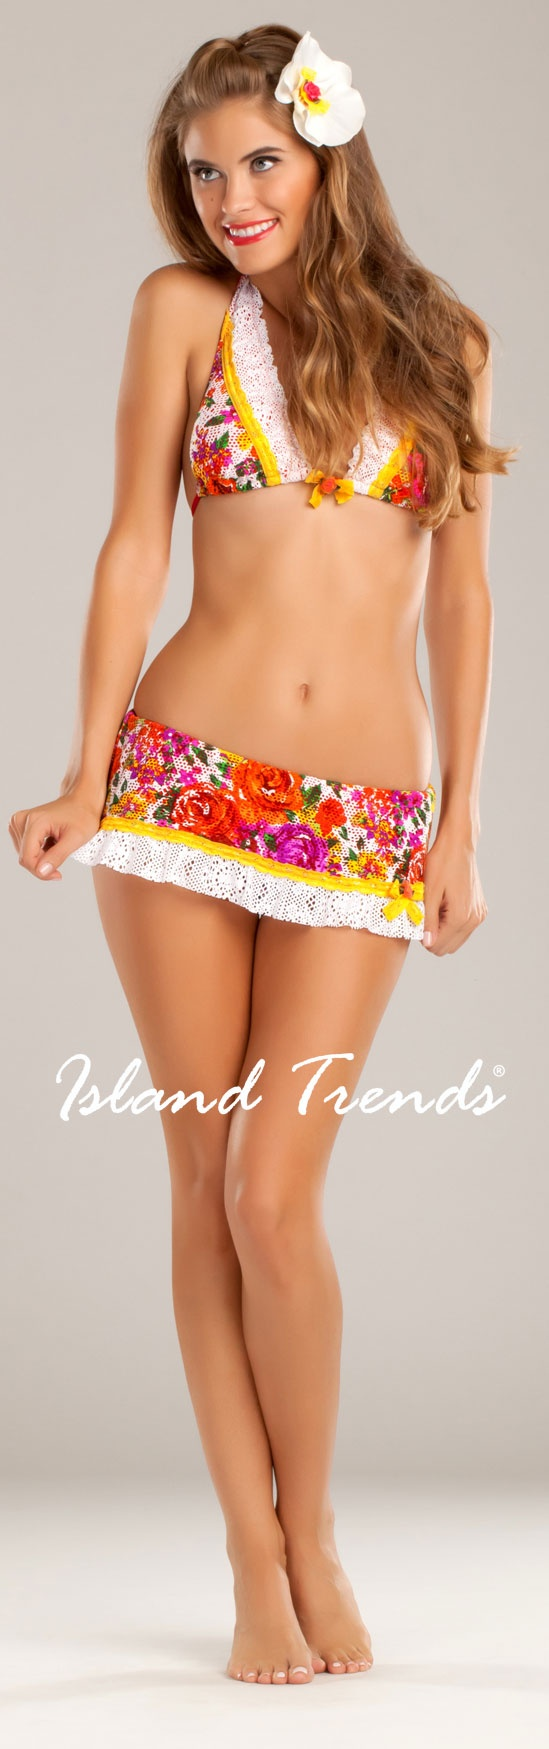 up betsey roses johnson bikini coming